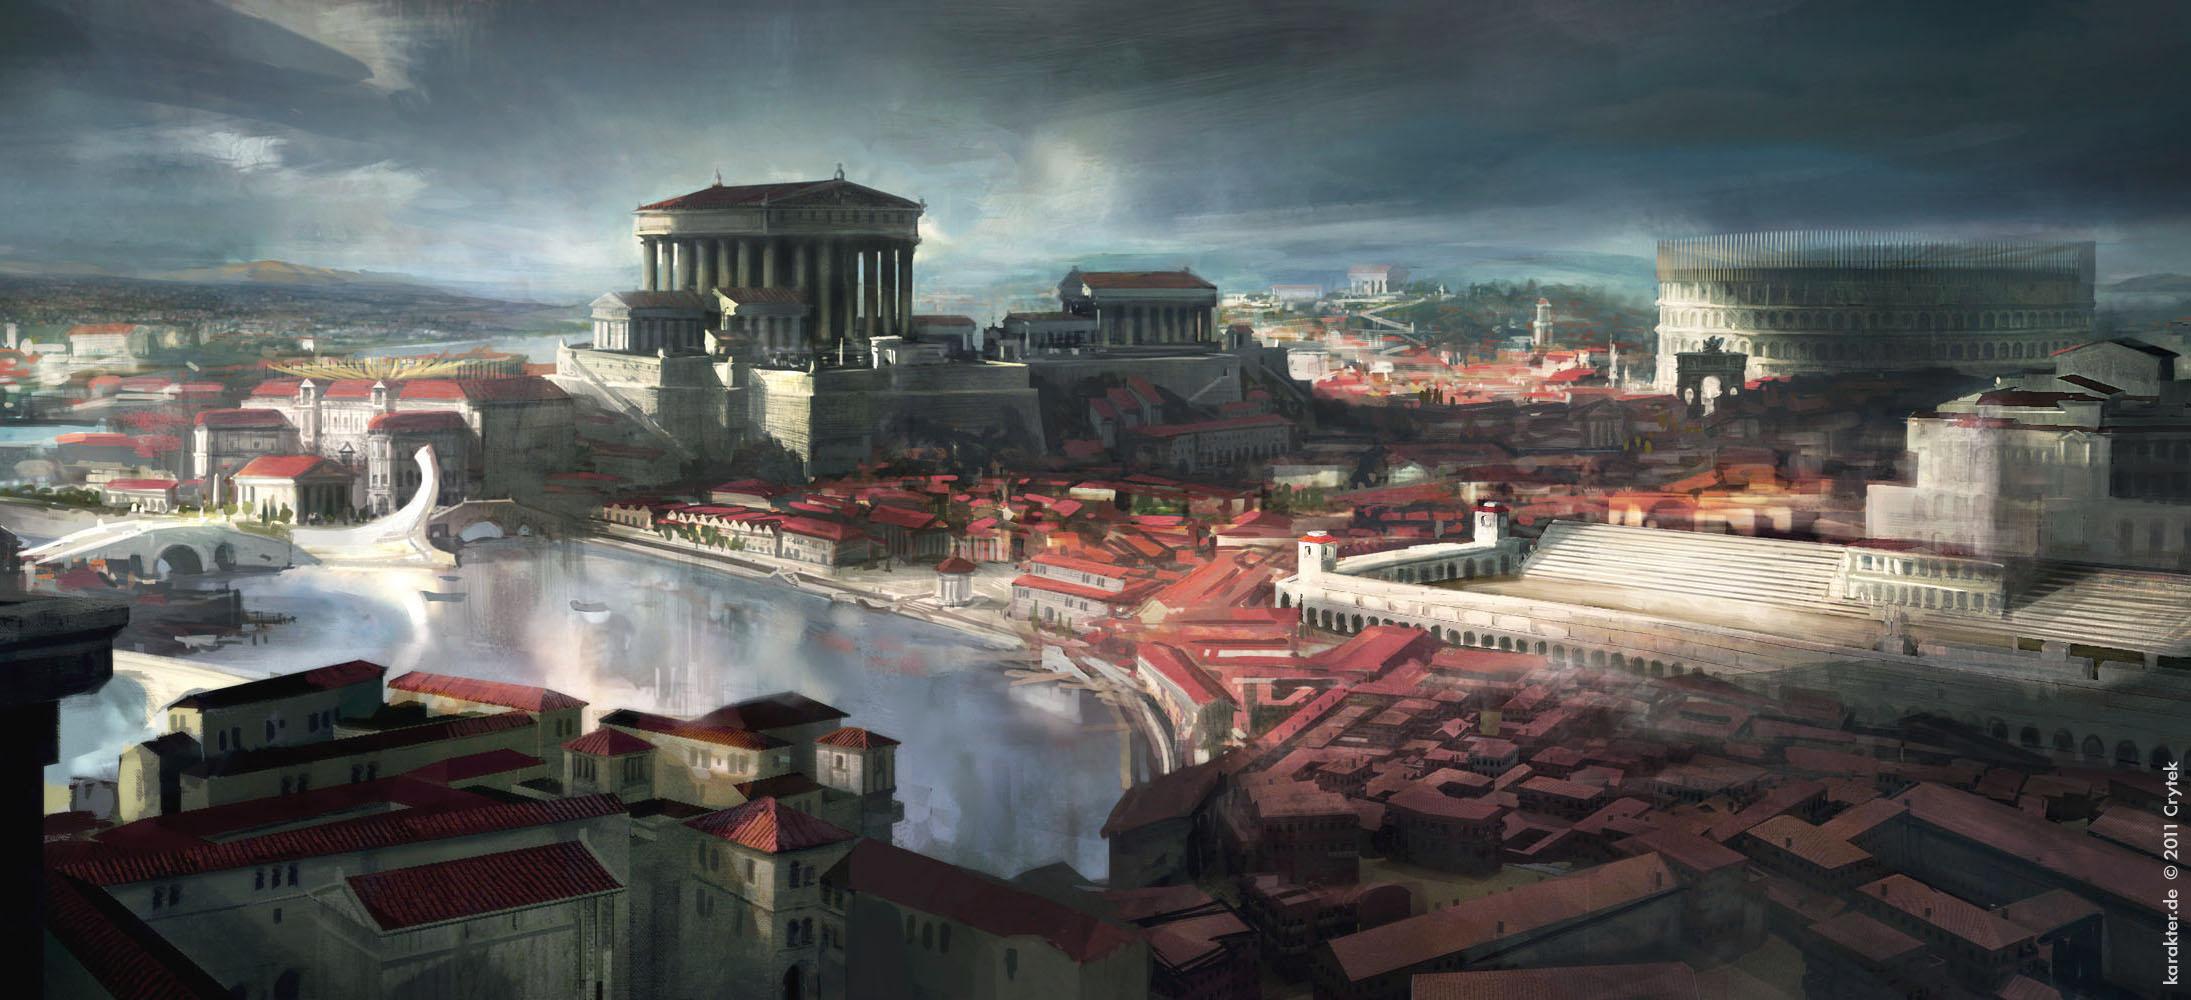 RUMOR: Assassin's Creed Legion – Coming 2020 & Set in Ancient Rome?